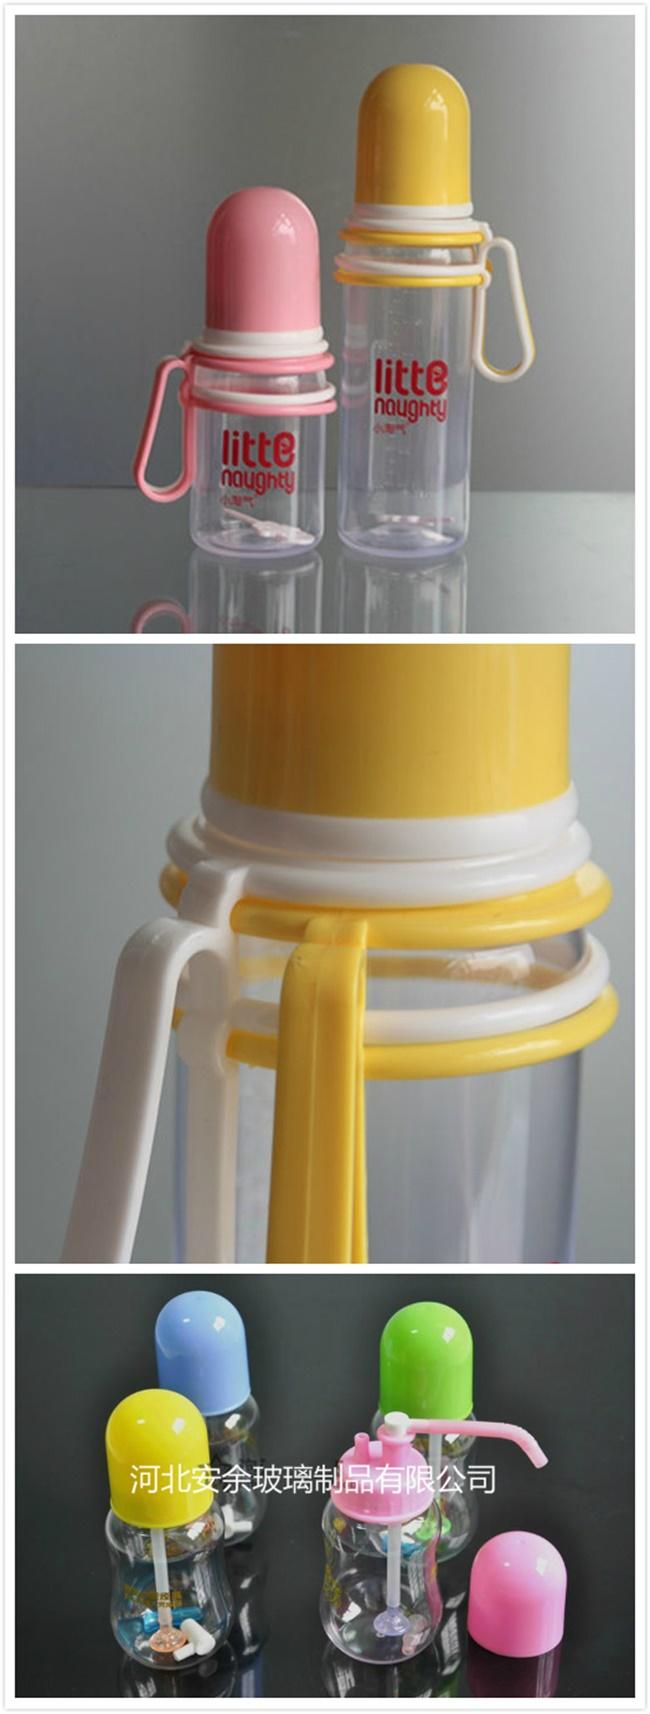 BPA Free 8oz 240ml Boroslicate Glass / PP Baby Feeding Bottle